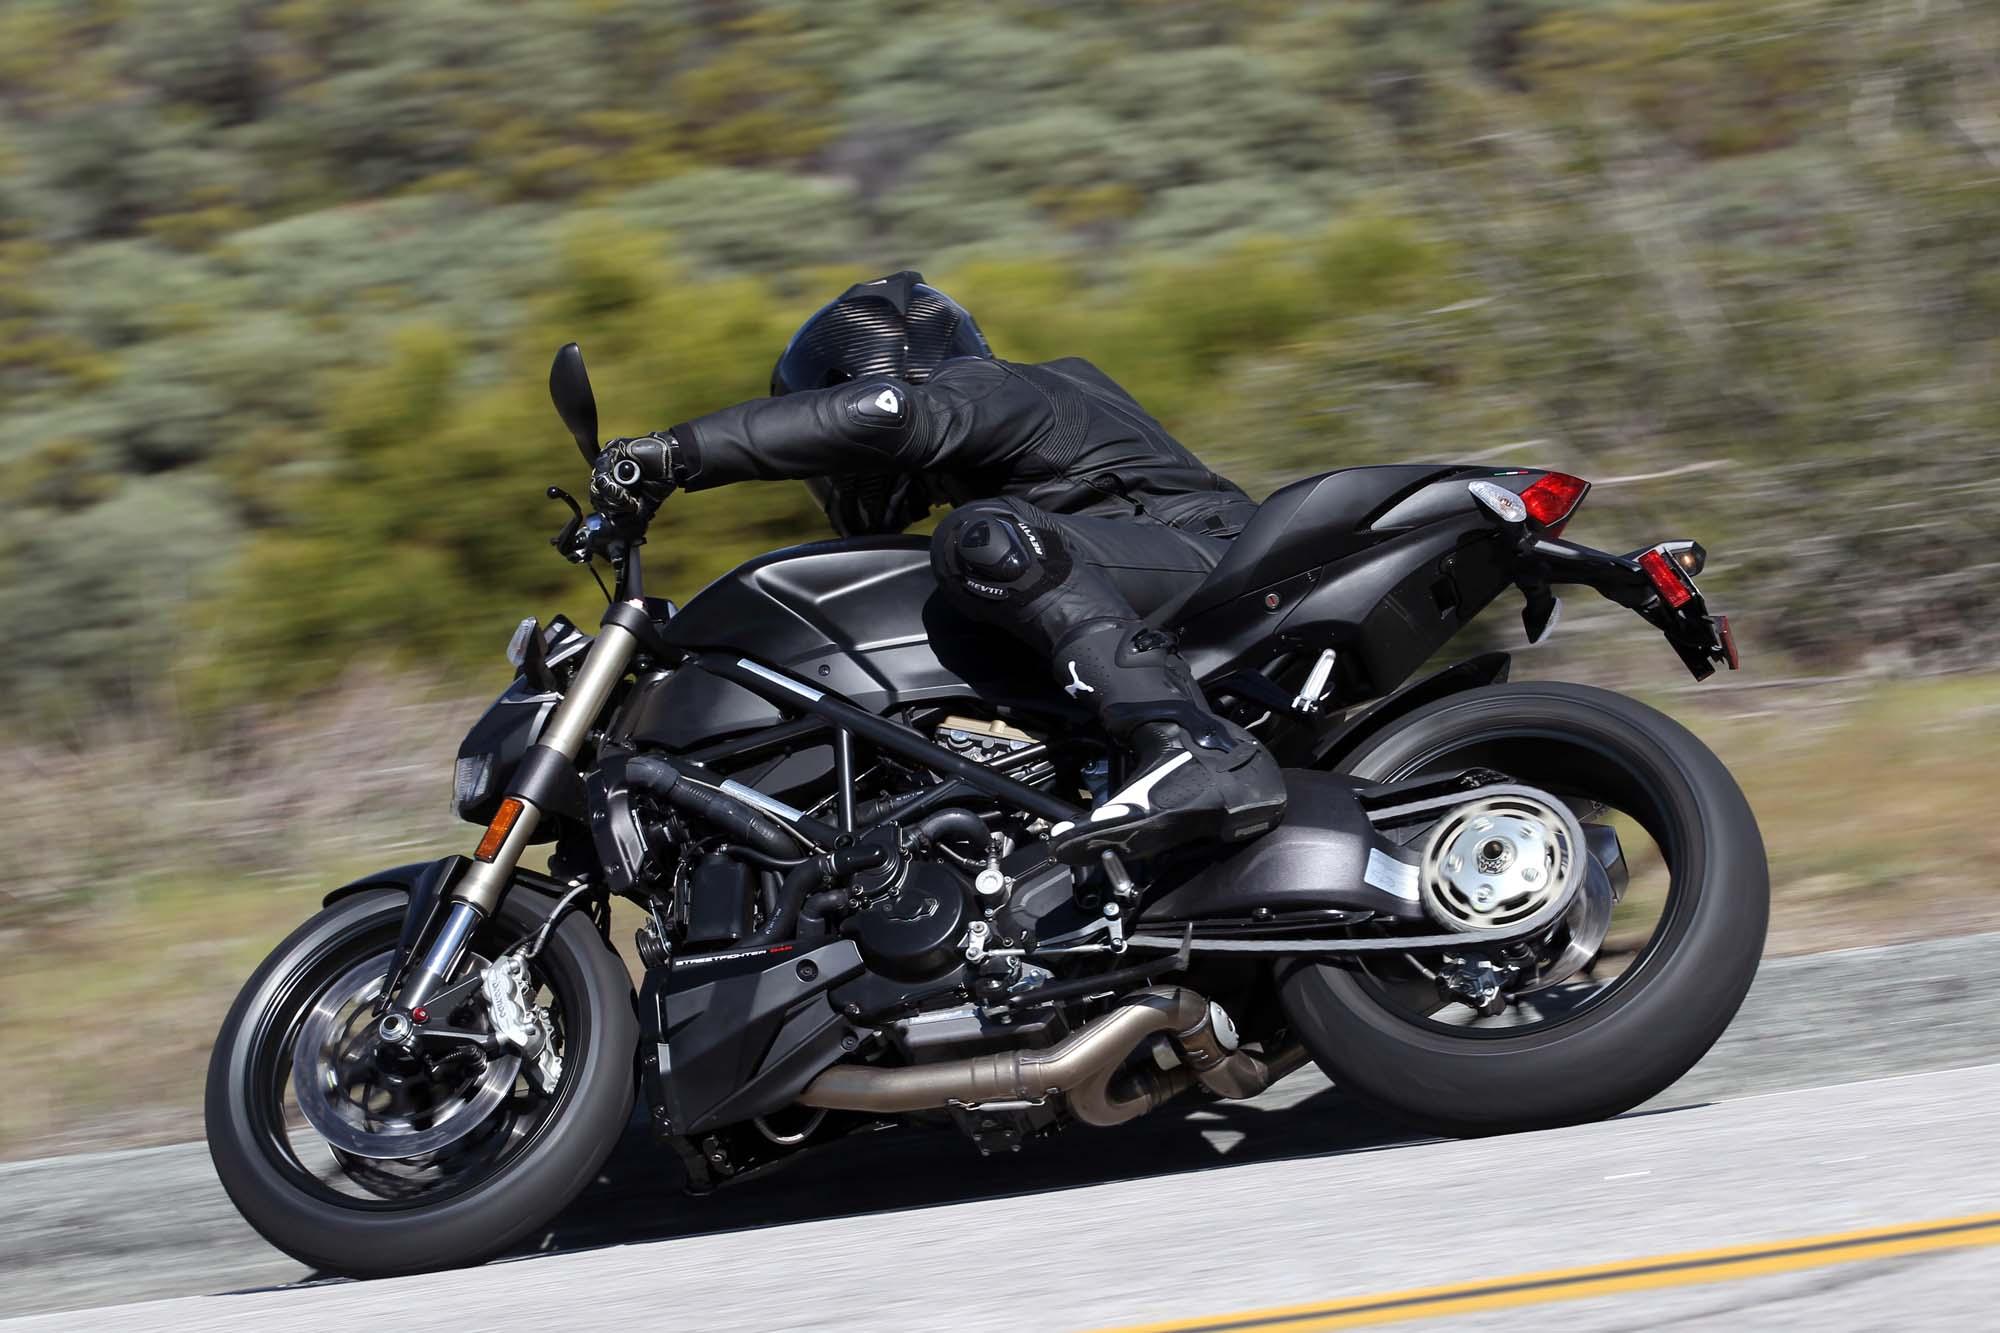 Ducati Streetfighter V4S   Motocicletas, Motos, Xj6